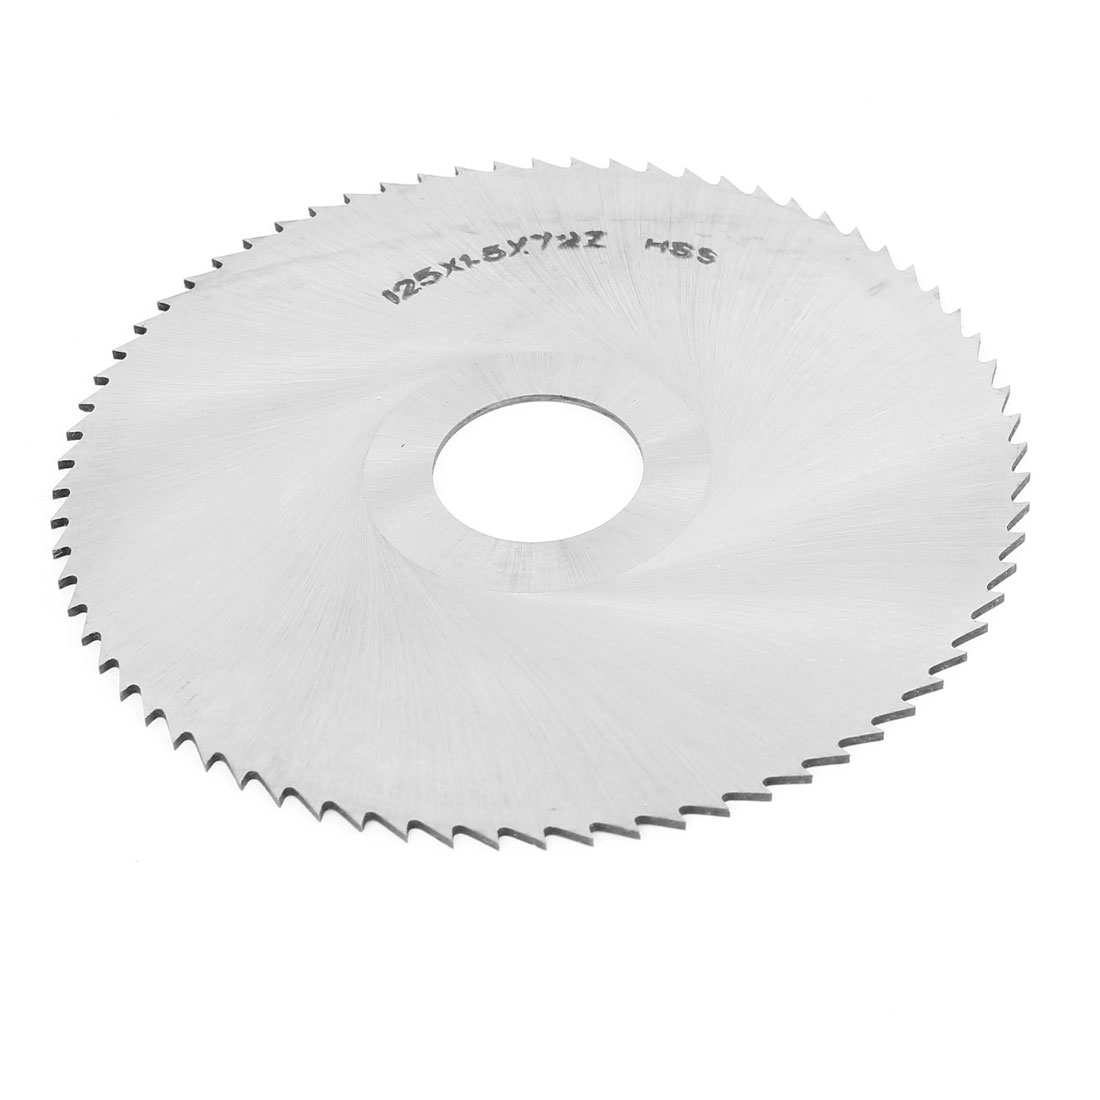 HSS 125mm OD 1.5mm Thick 27mm Arbor Dia 72 Teeth Ctting Wheel Slitting Saw